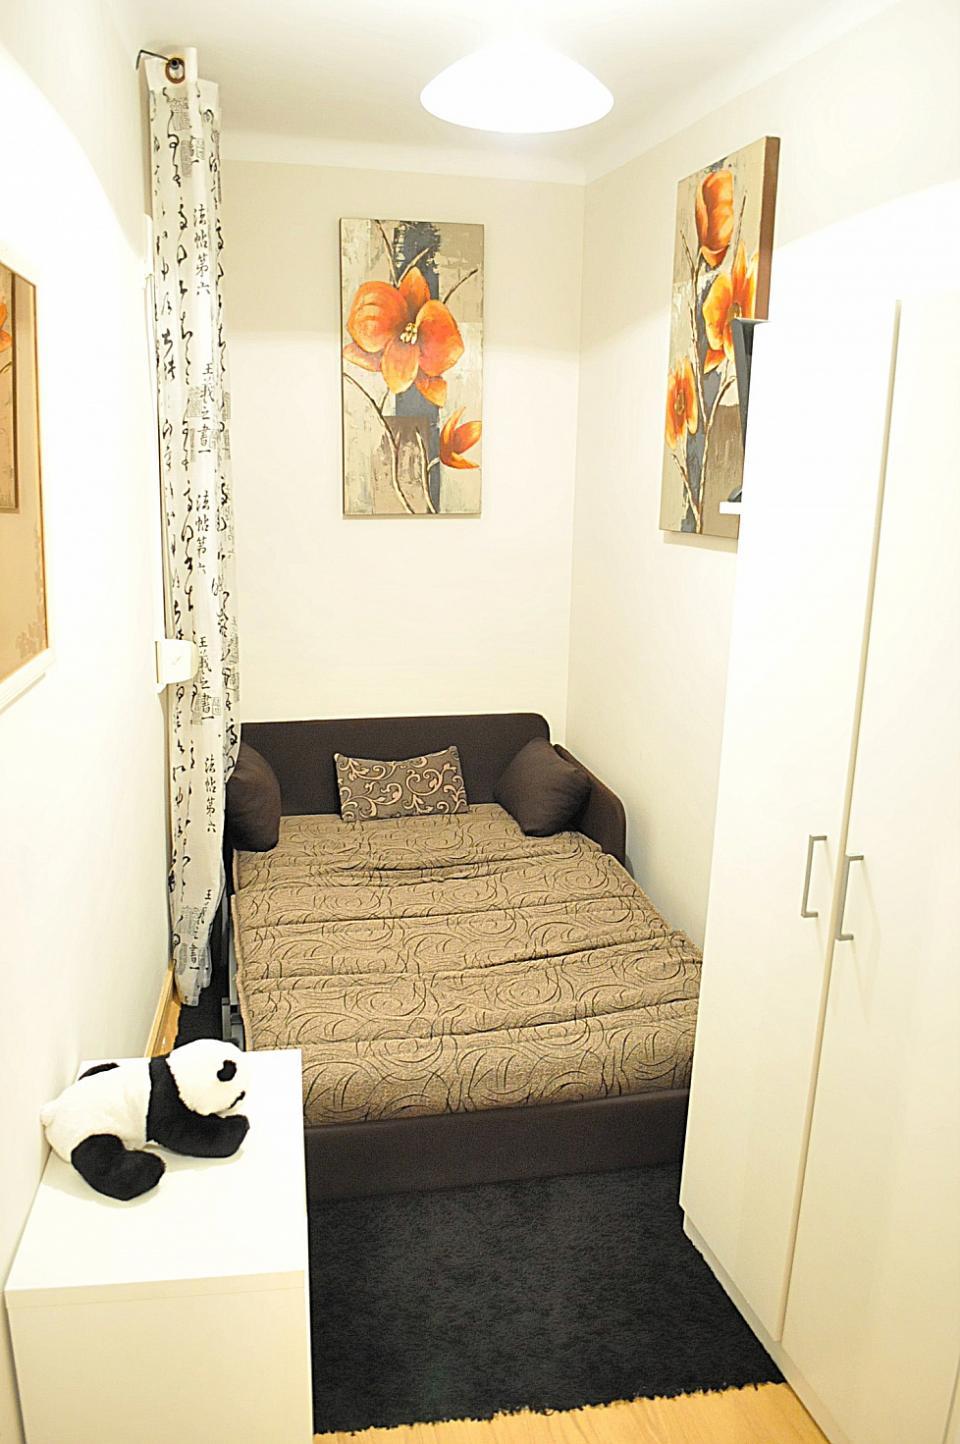 Habitaci n en alquiler plaza espa a barcelona home for Alquiler habitacion plaza espana madrid